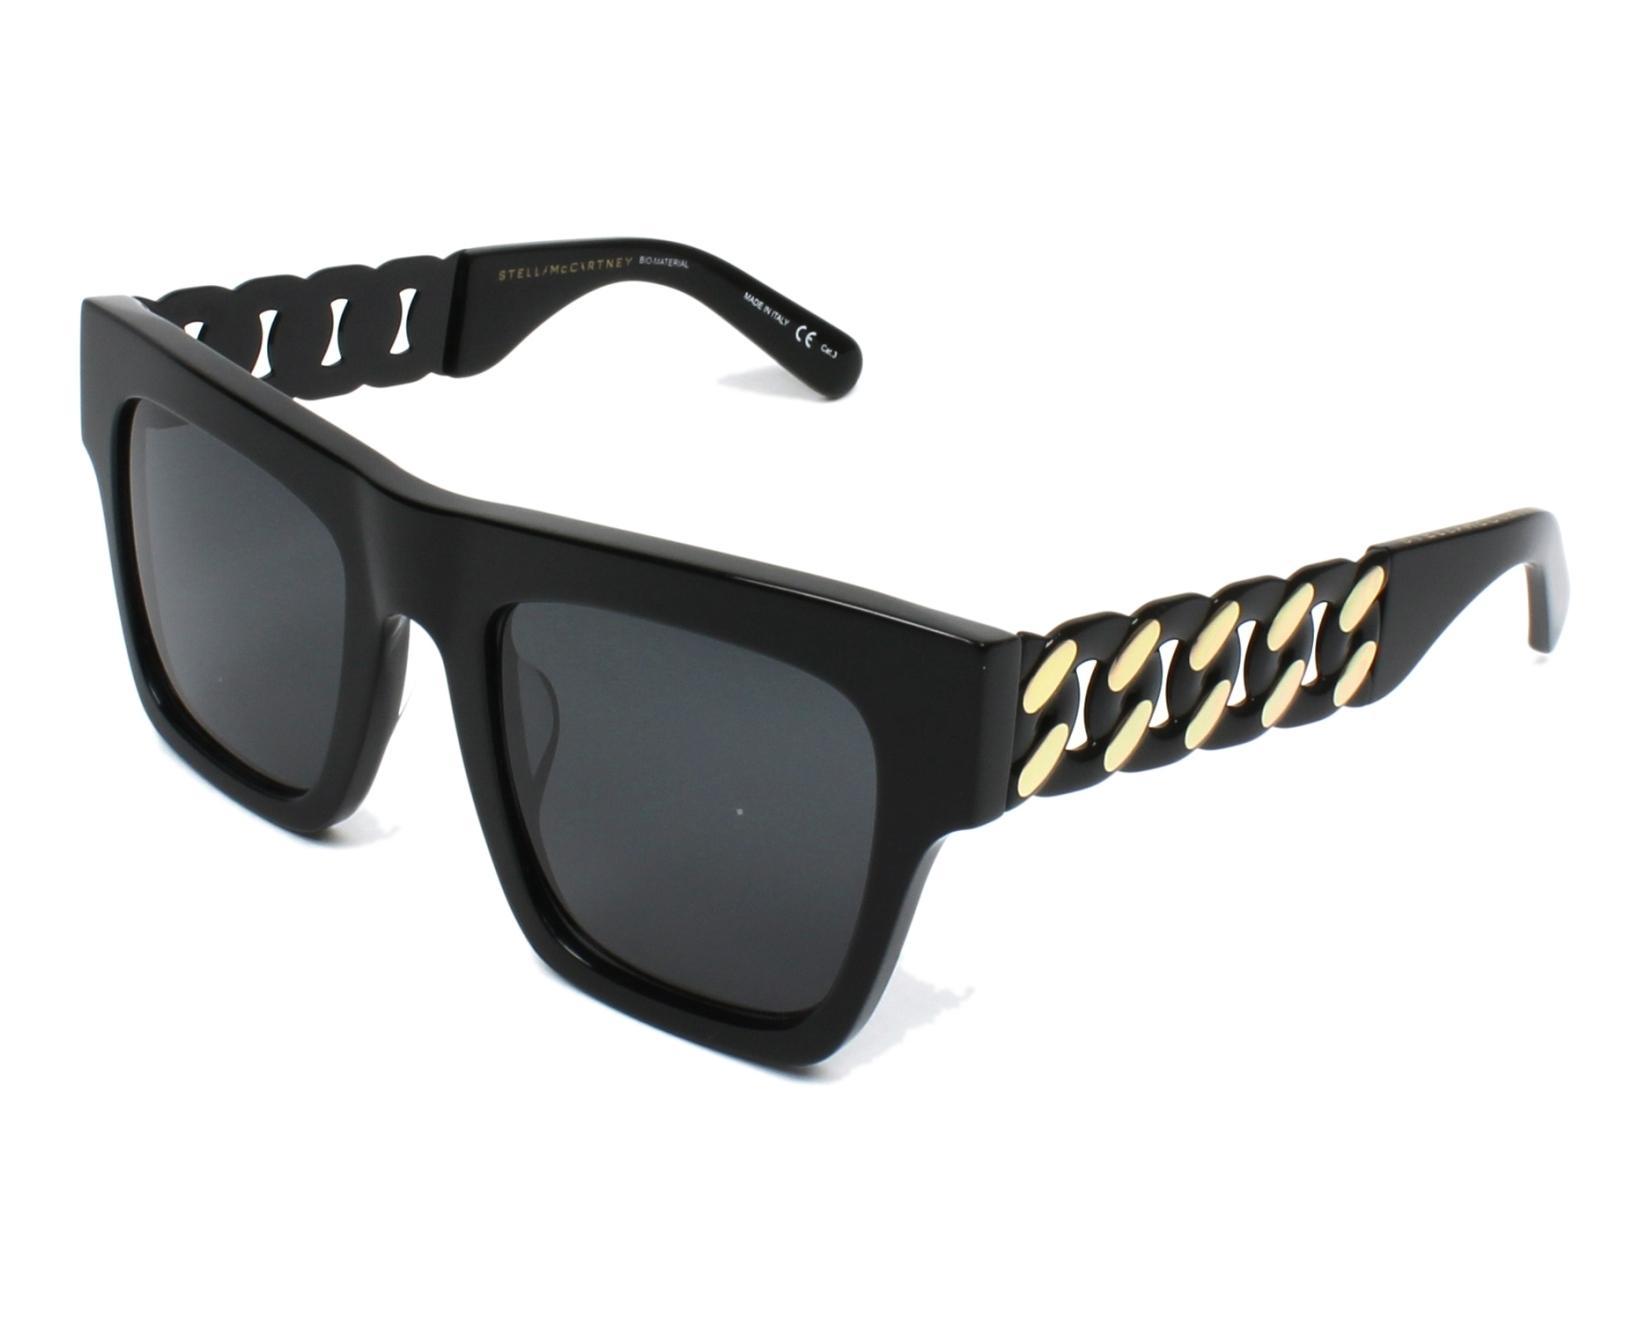 fa09f37b43 Stella Mccartney Sunglasses Sc 0066 S 001 Black Visionet